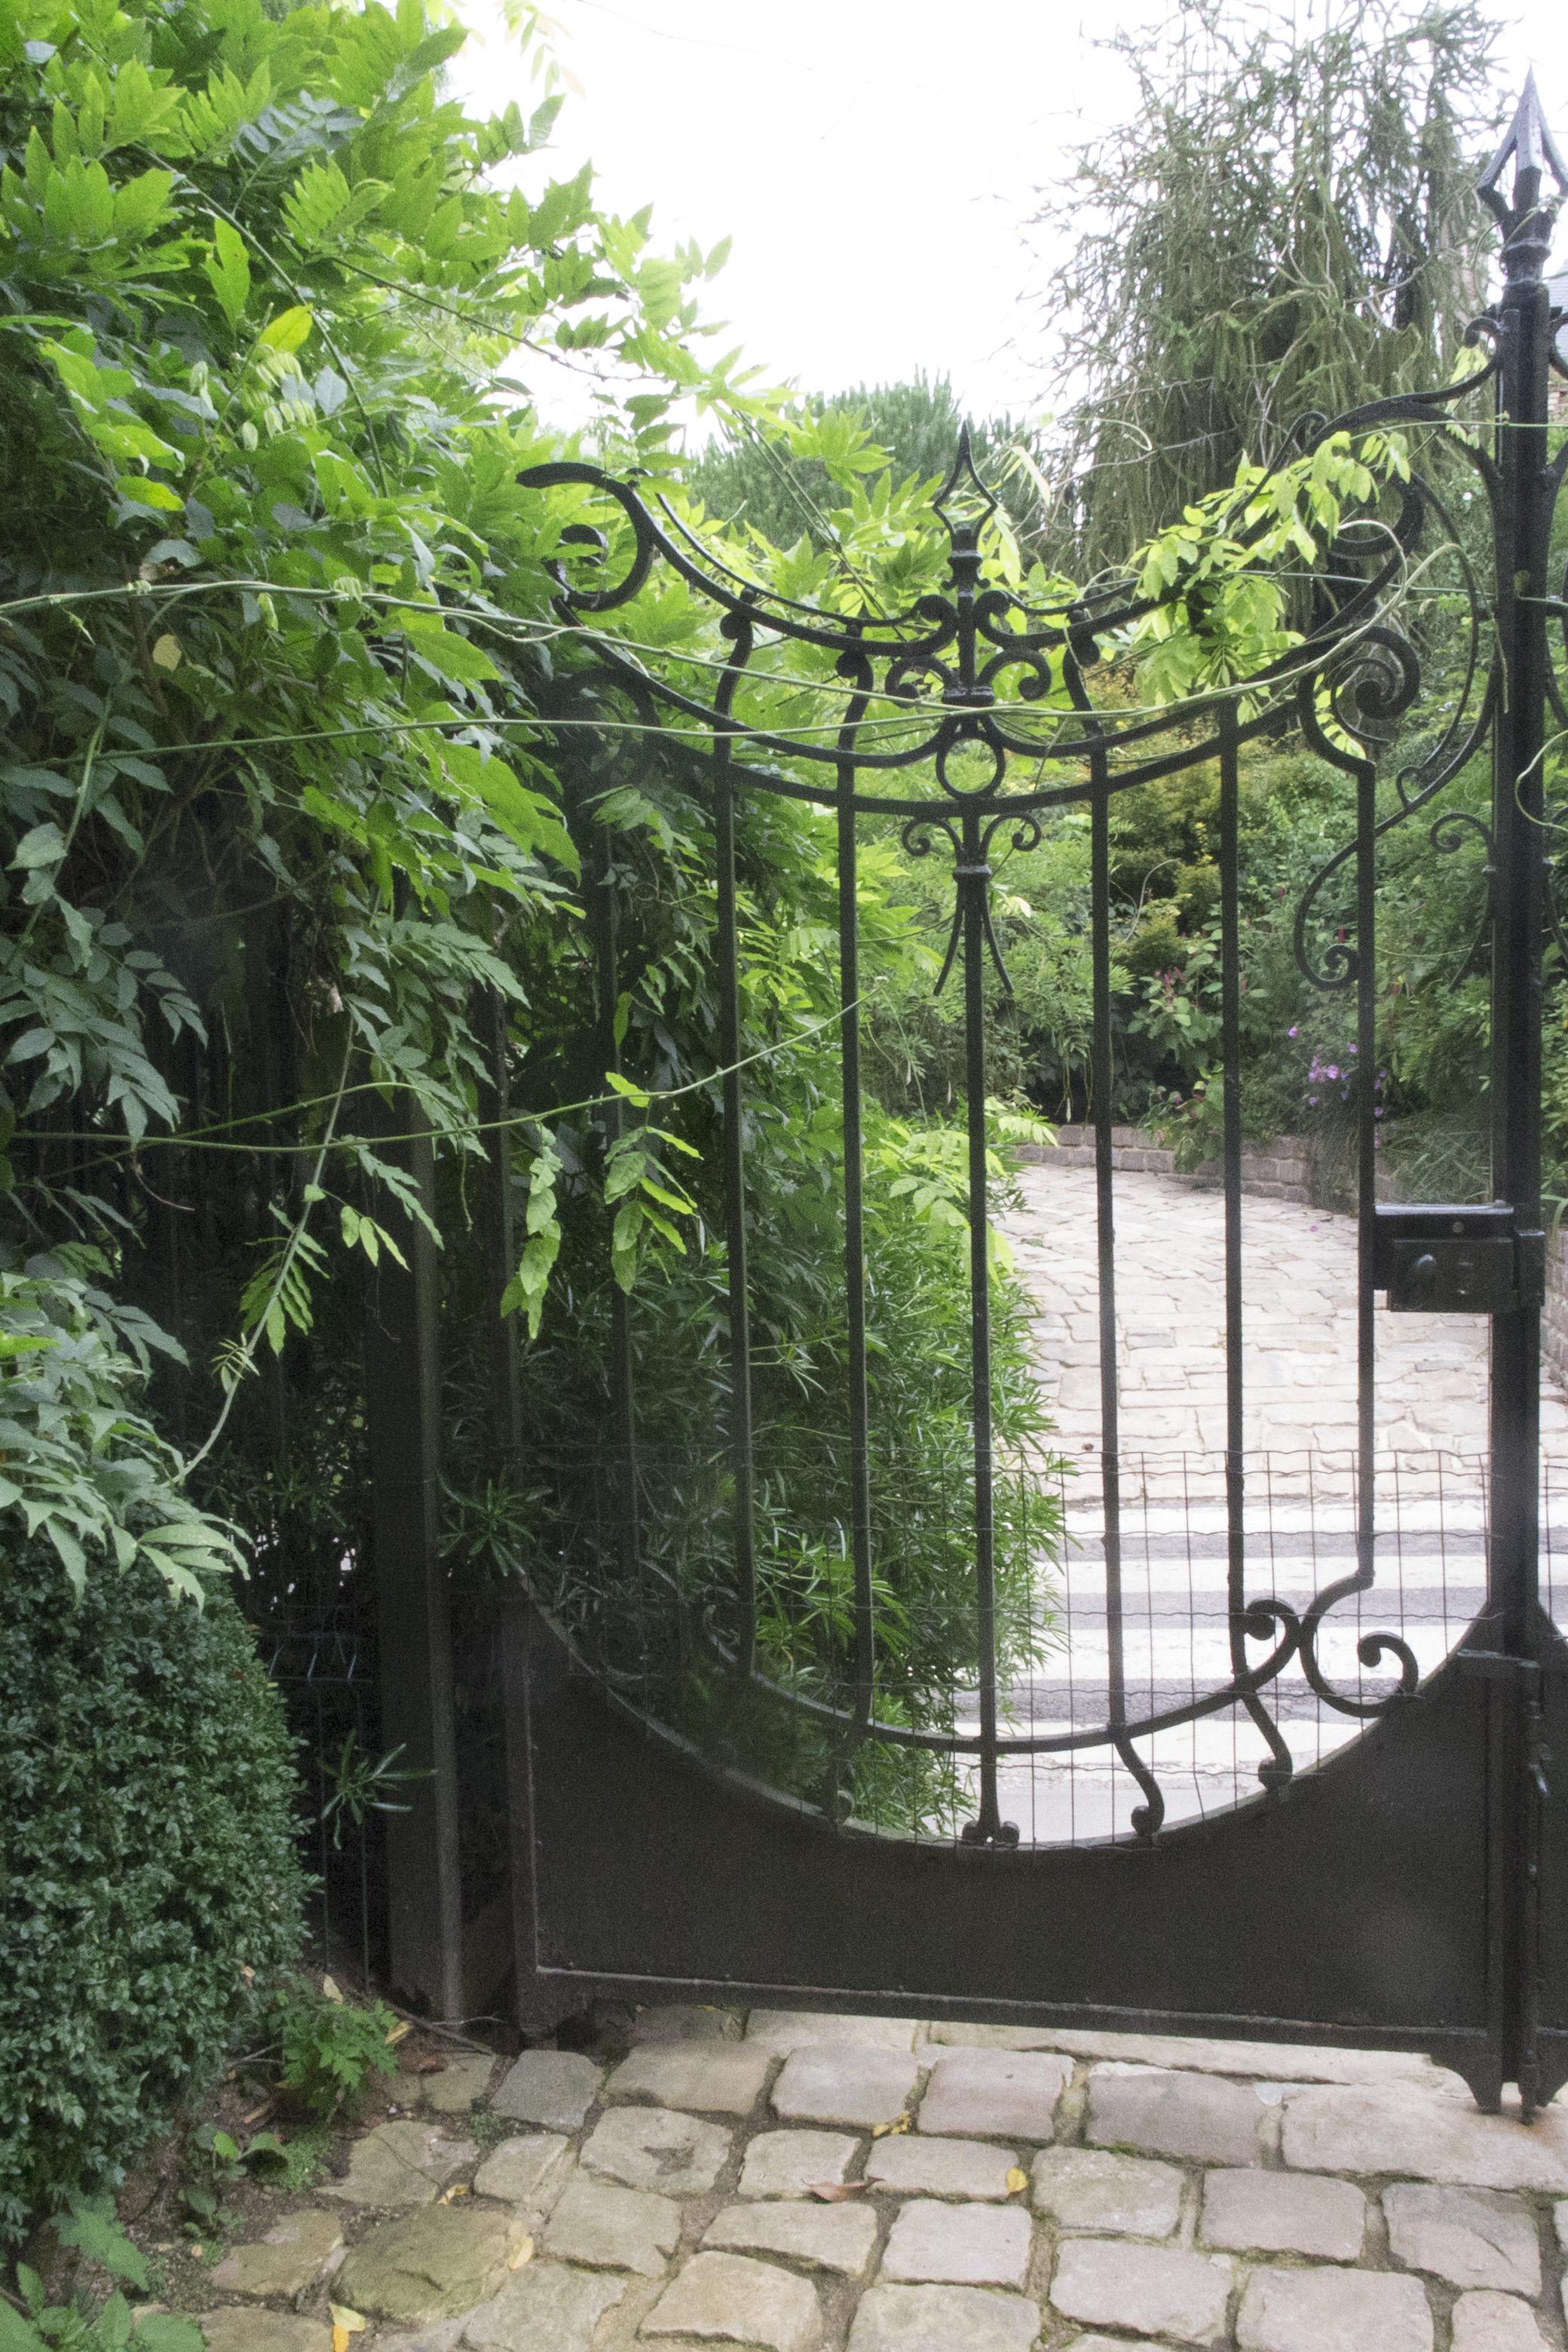 Over-sized gates create a majestic entrance